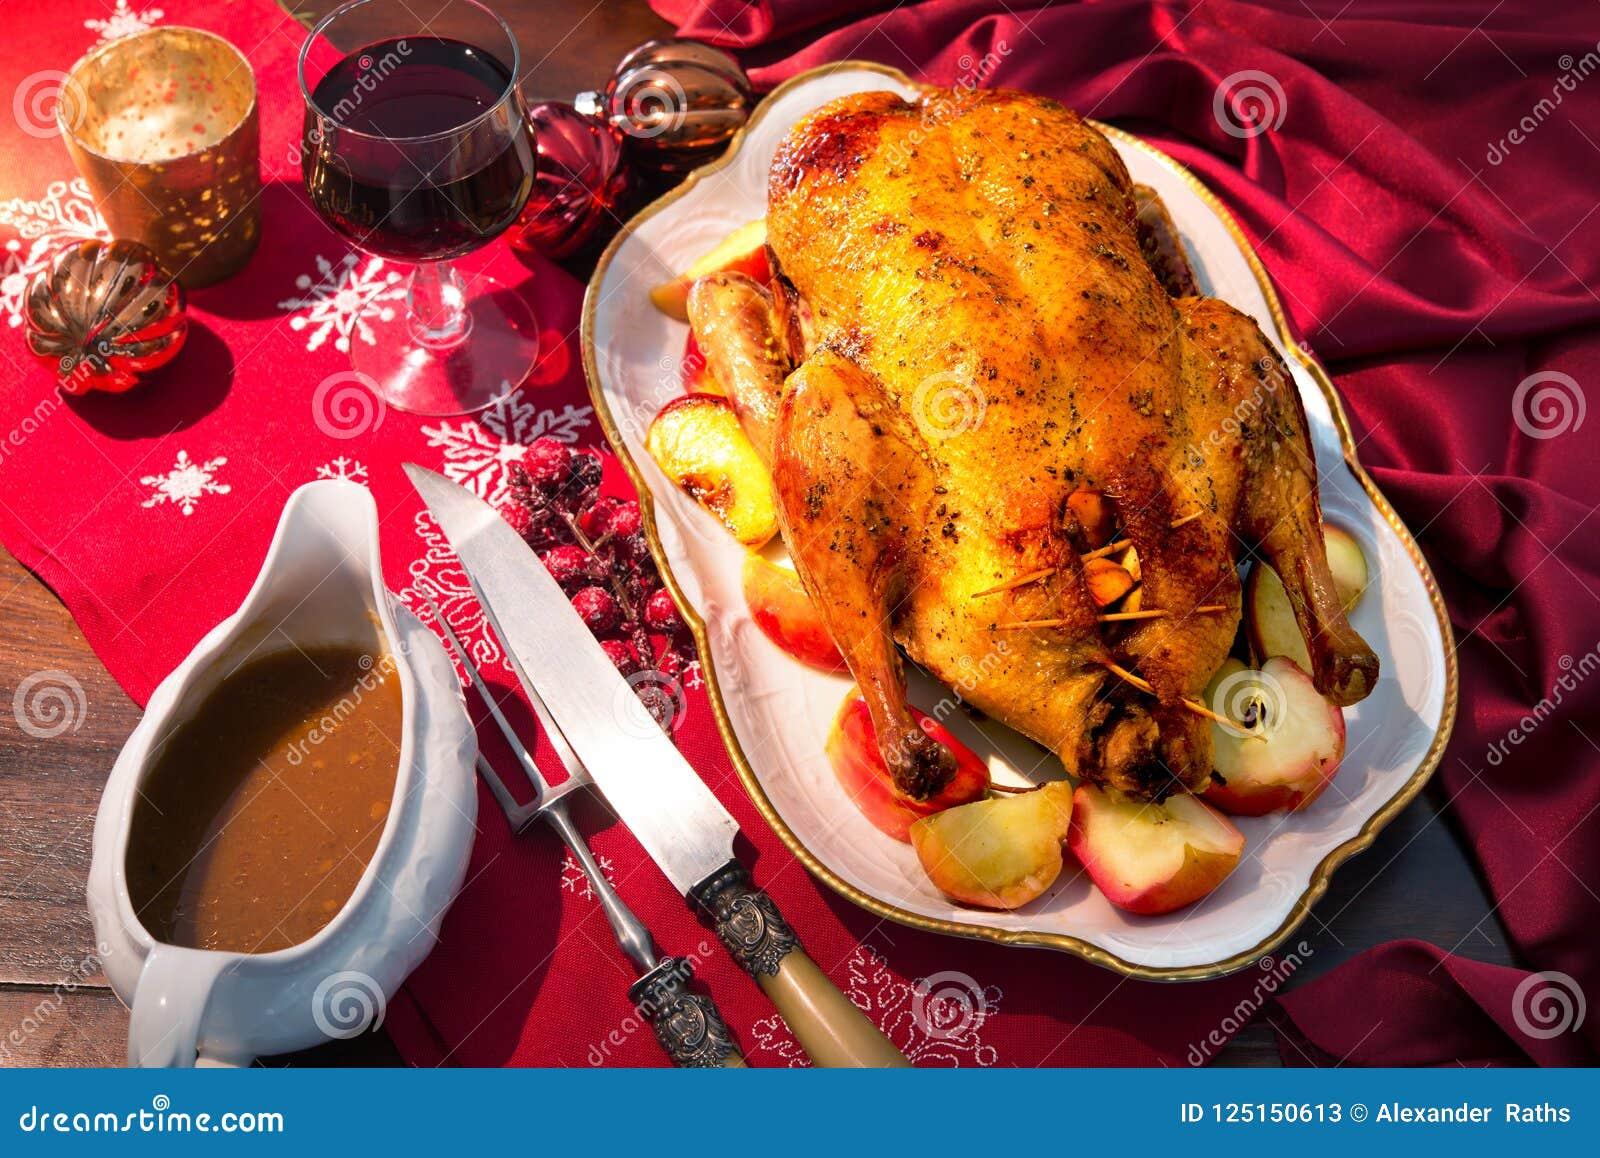 Christmas Duck Recipes.Baked Christmas Duck Stock Image Image Of Christmas 125150613